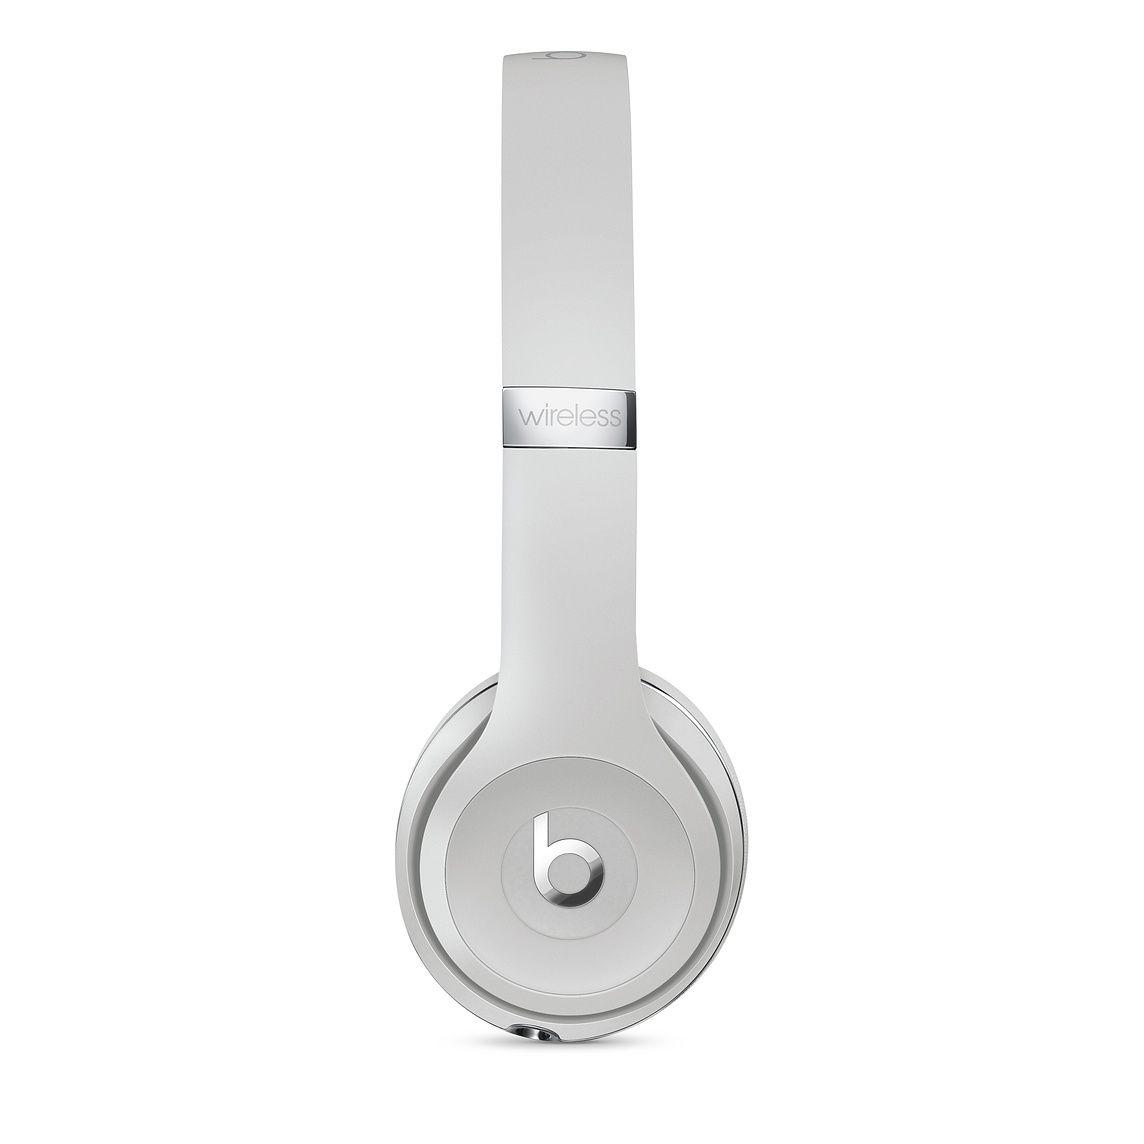 Beats Solo3 Wireless Headphones Satin Silver Apple Wireless Headphones Headphones Black Headphones